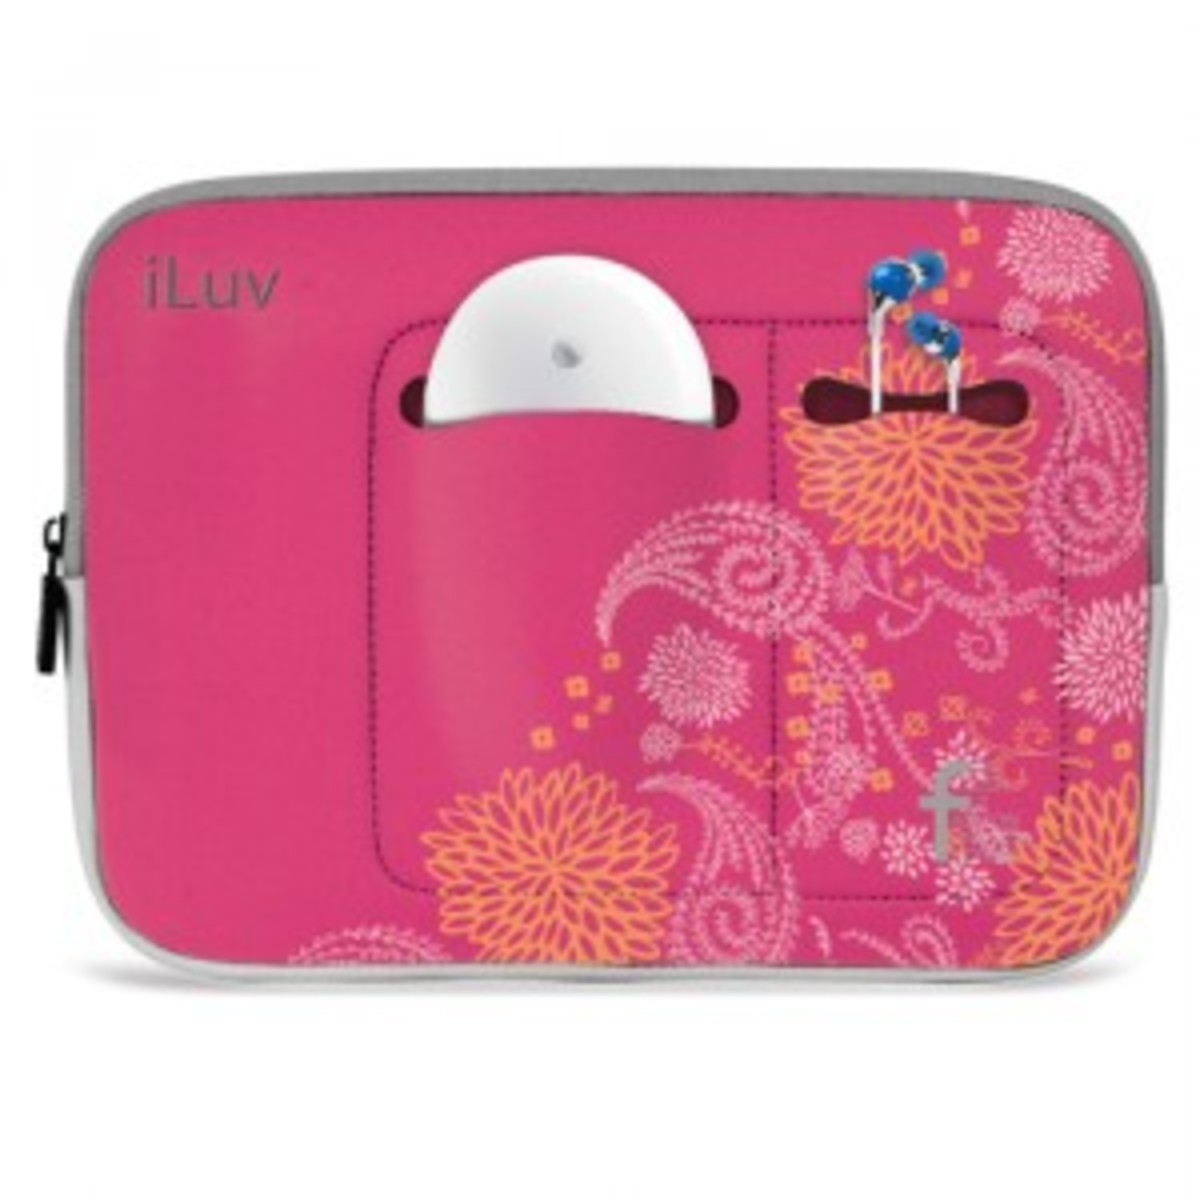 iluv iPad Purse in Pink